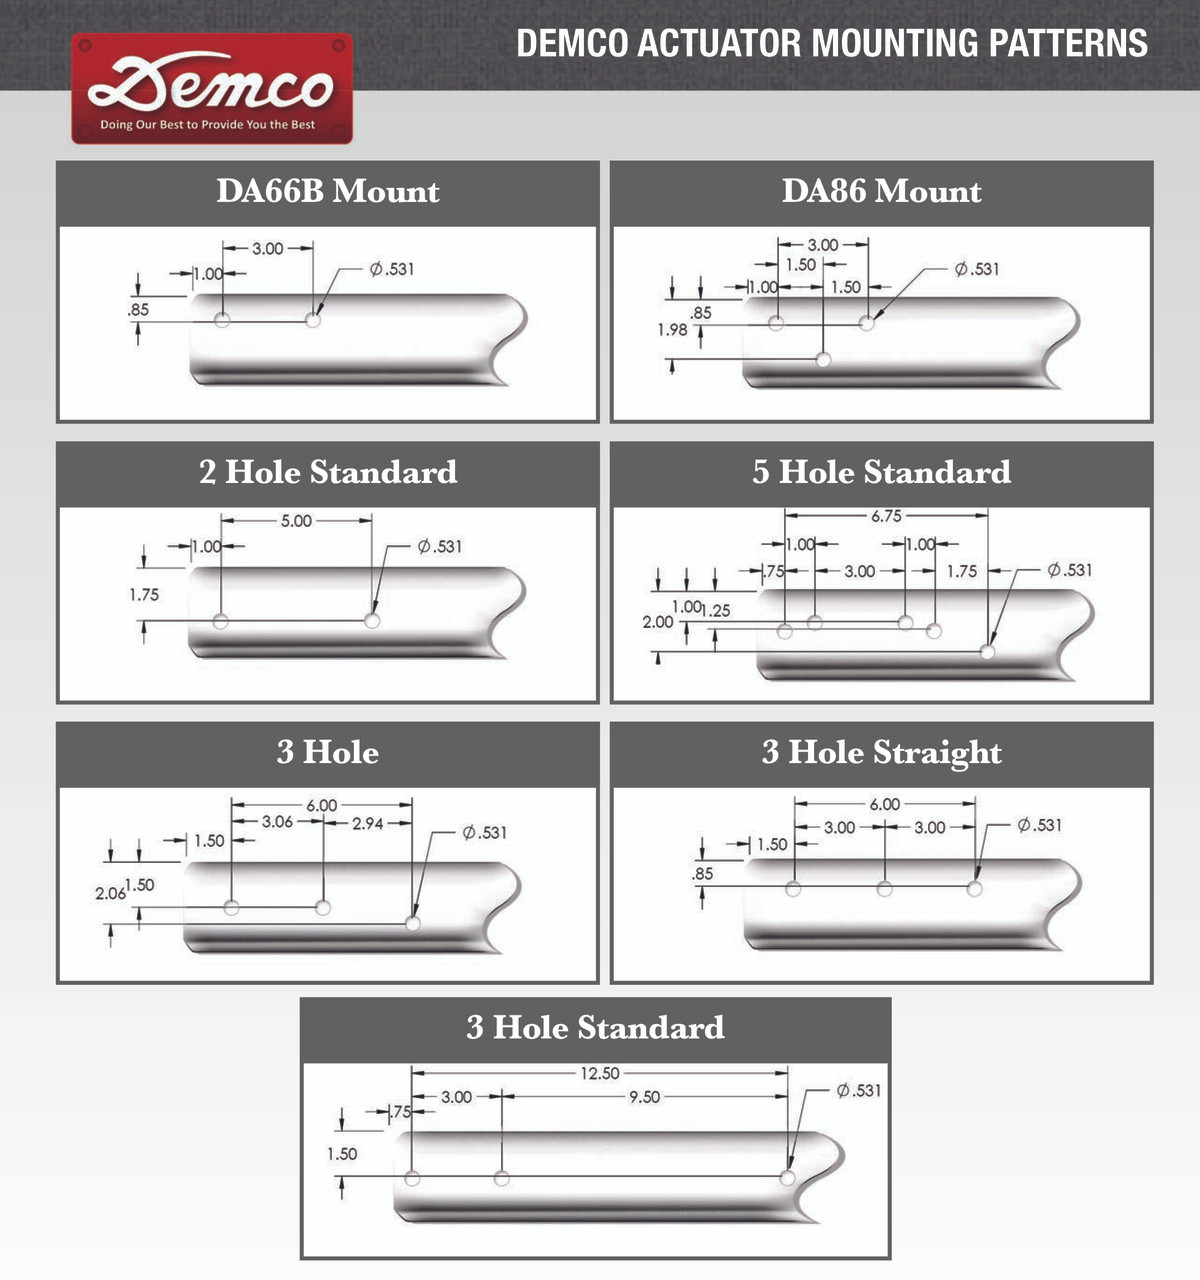 8102131 --- Demco Hydraulic Brake Actuator with Down Channel - 12,500 lb Capacity - Model DA10